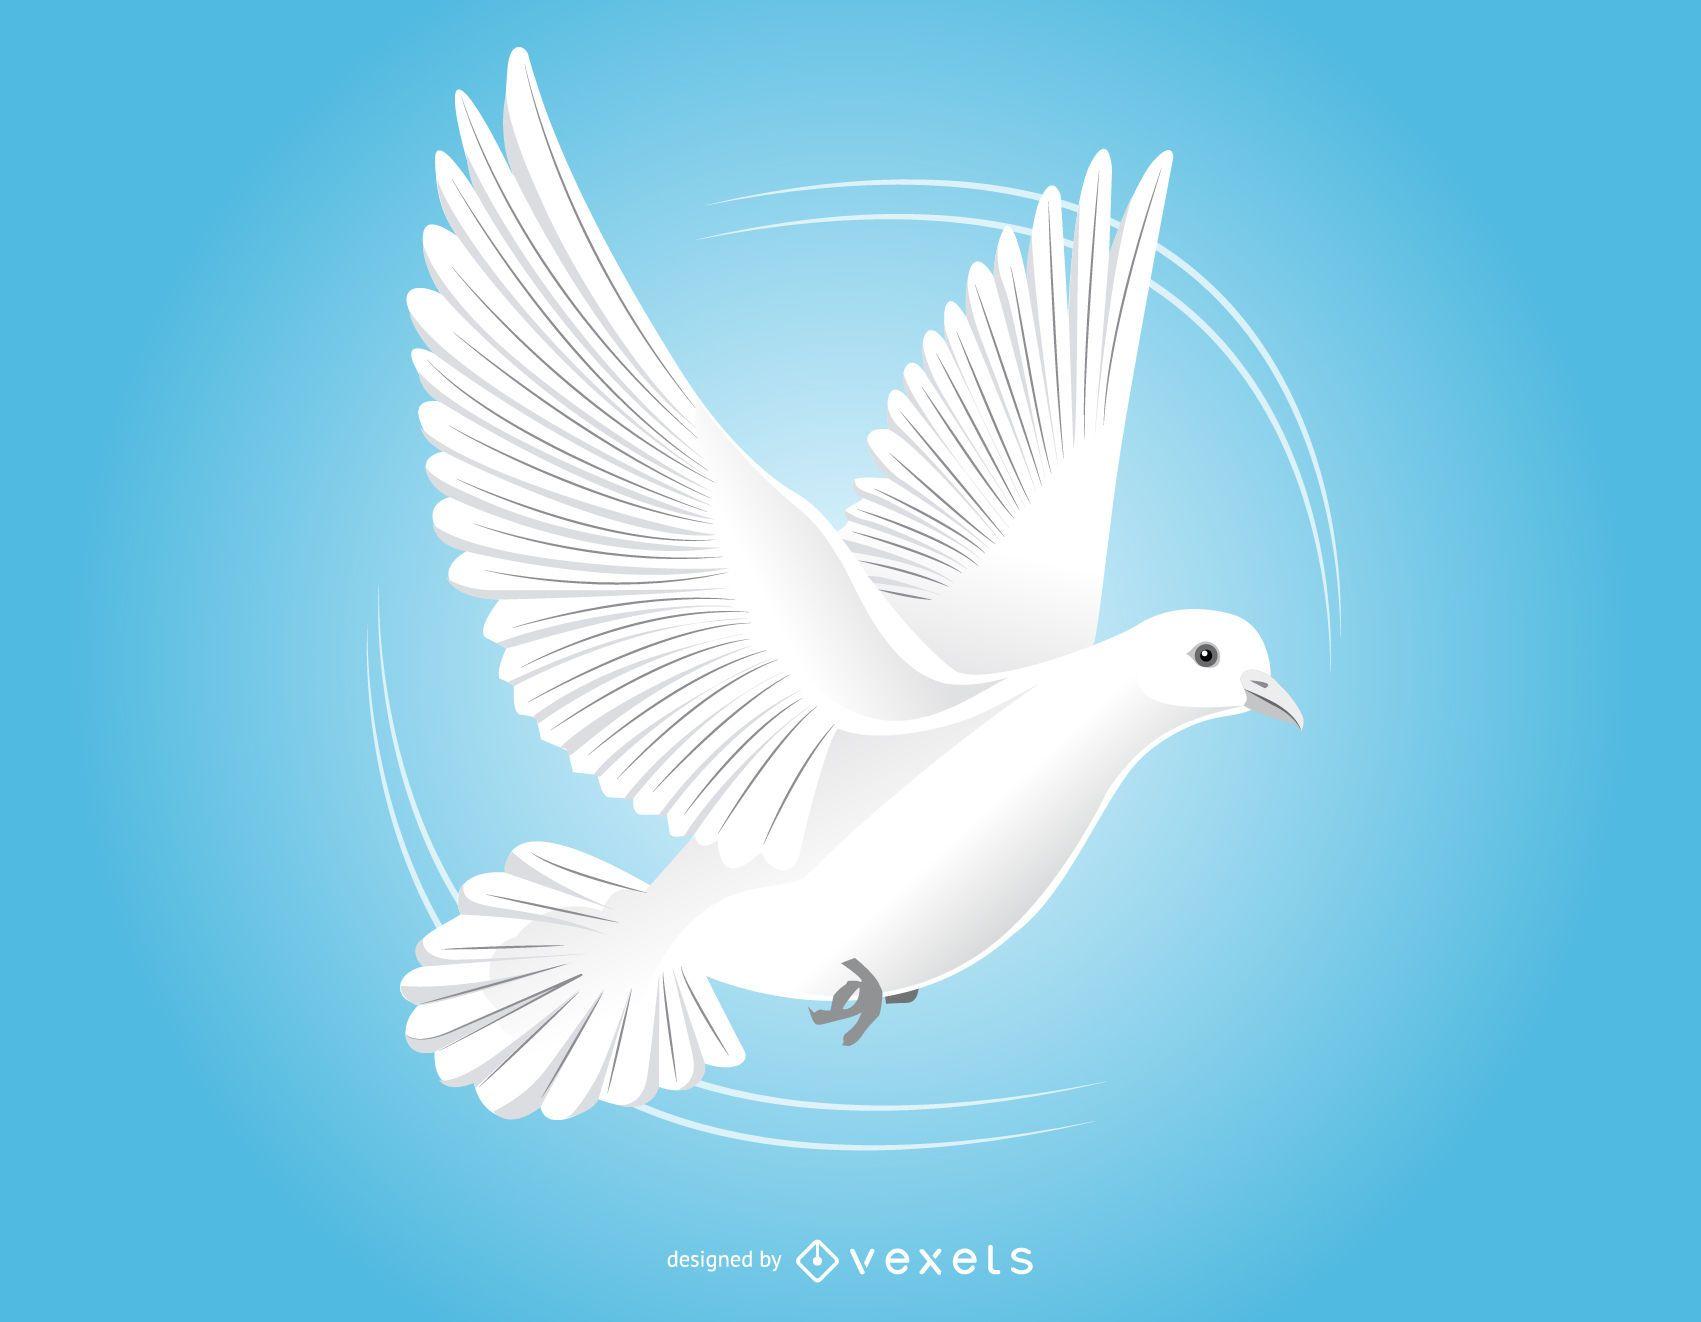 Flying Dove Black & White Sketch - Vector download